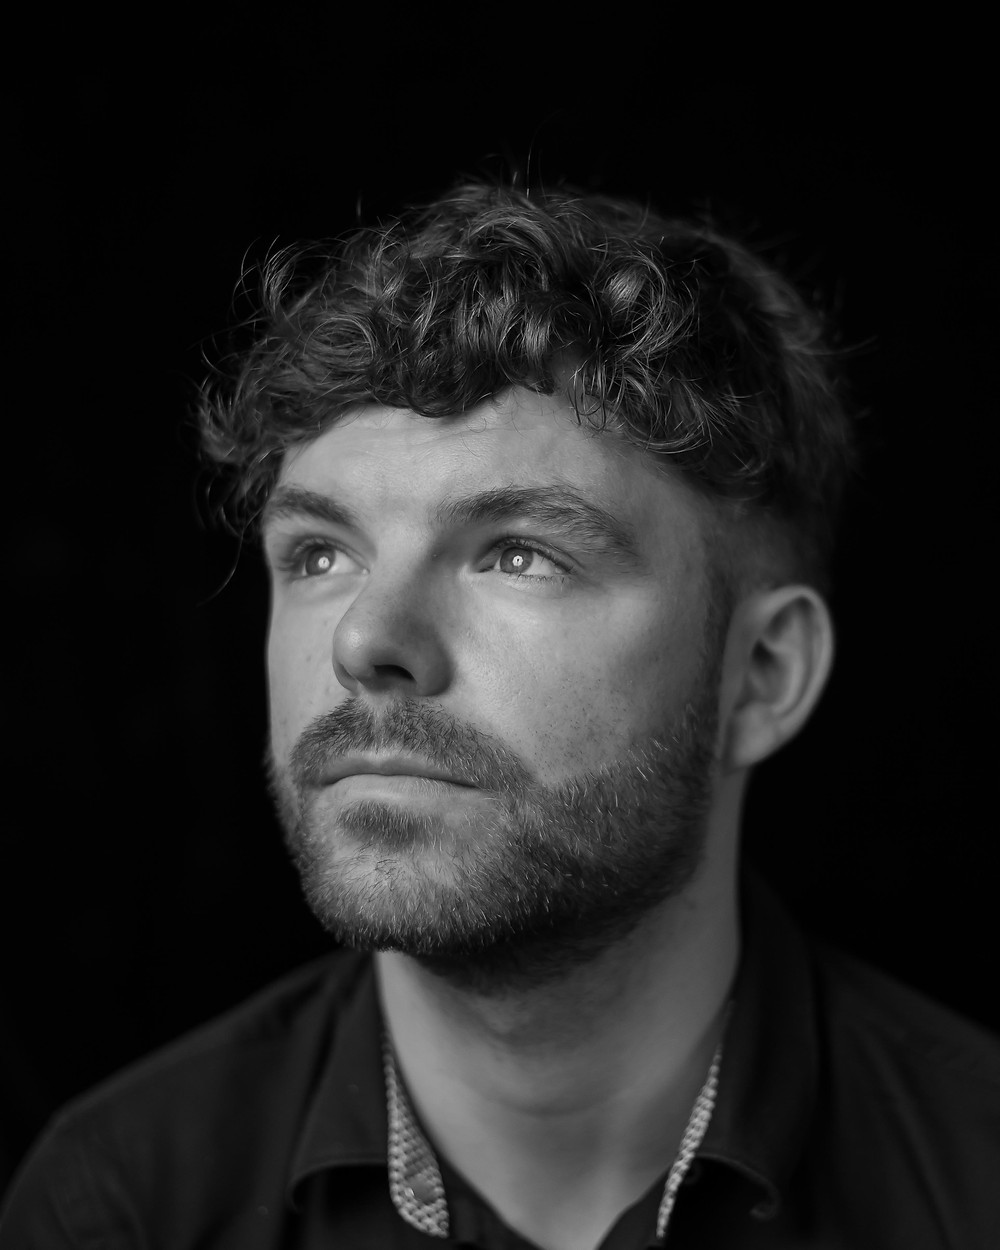 Photo of Irish Singer Songwriter Faraway Martin by Aidan Connaughton